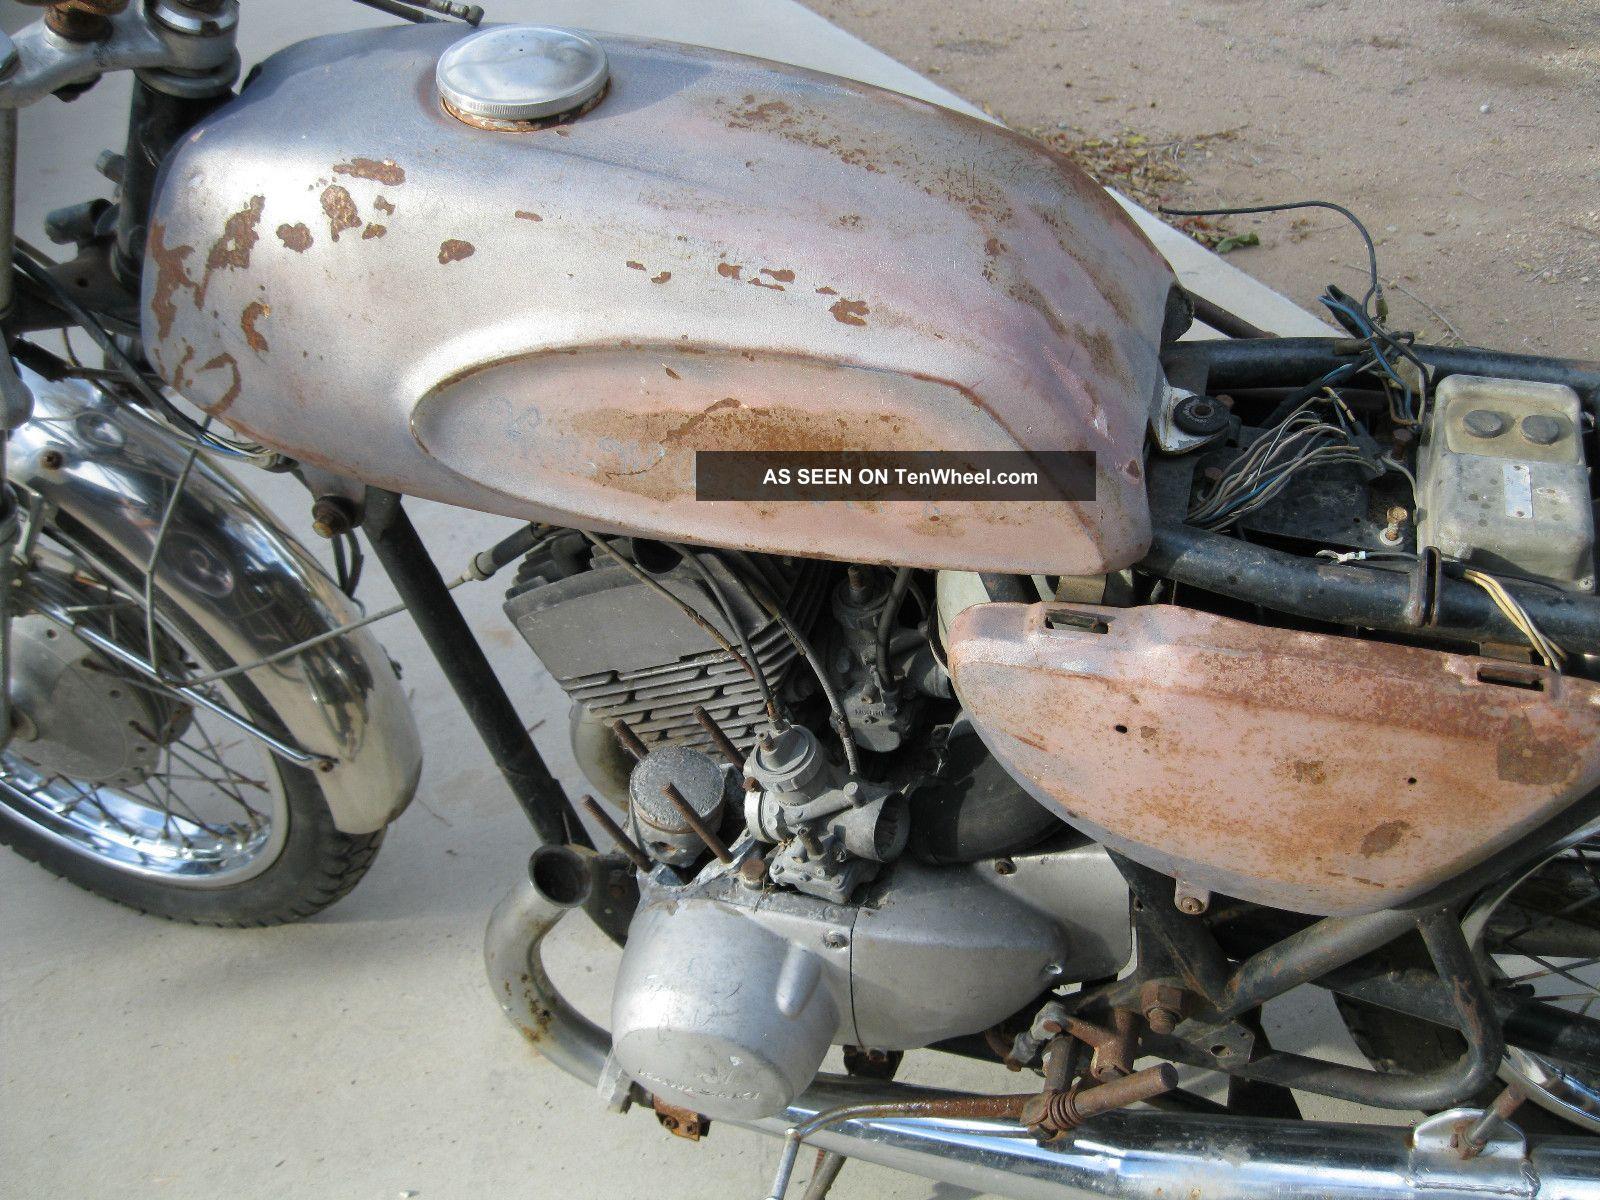 1969 Kawasaki H1 Mach Iii 500 Triple Blue Streak Vintage